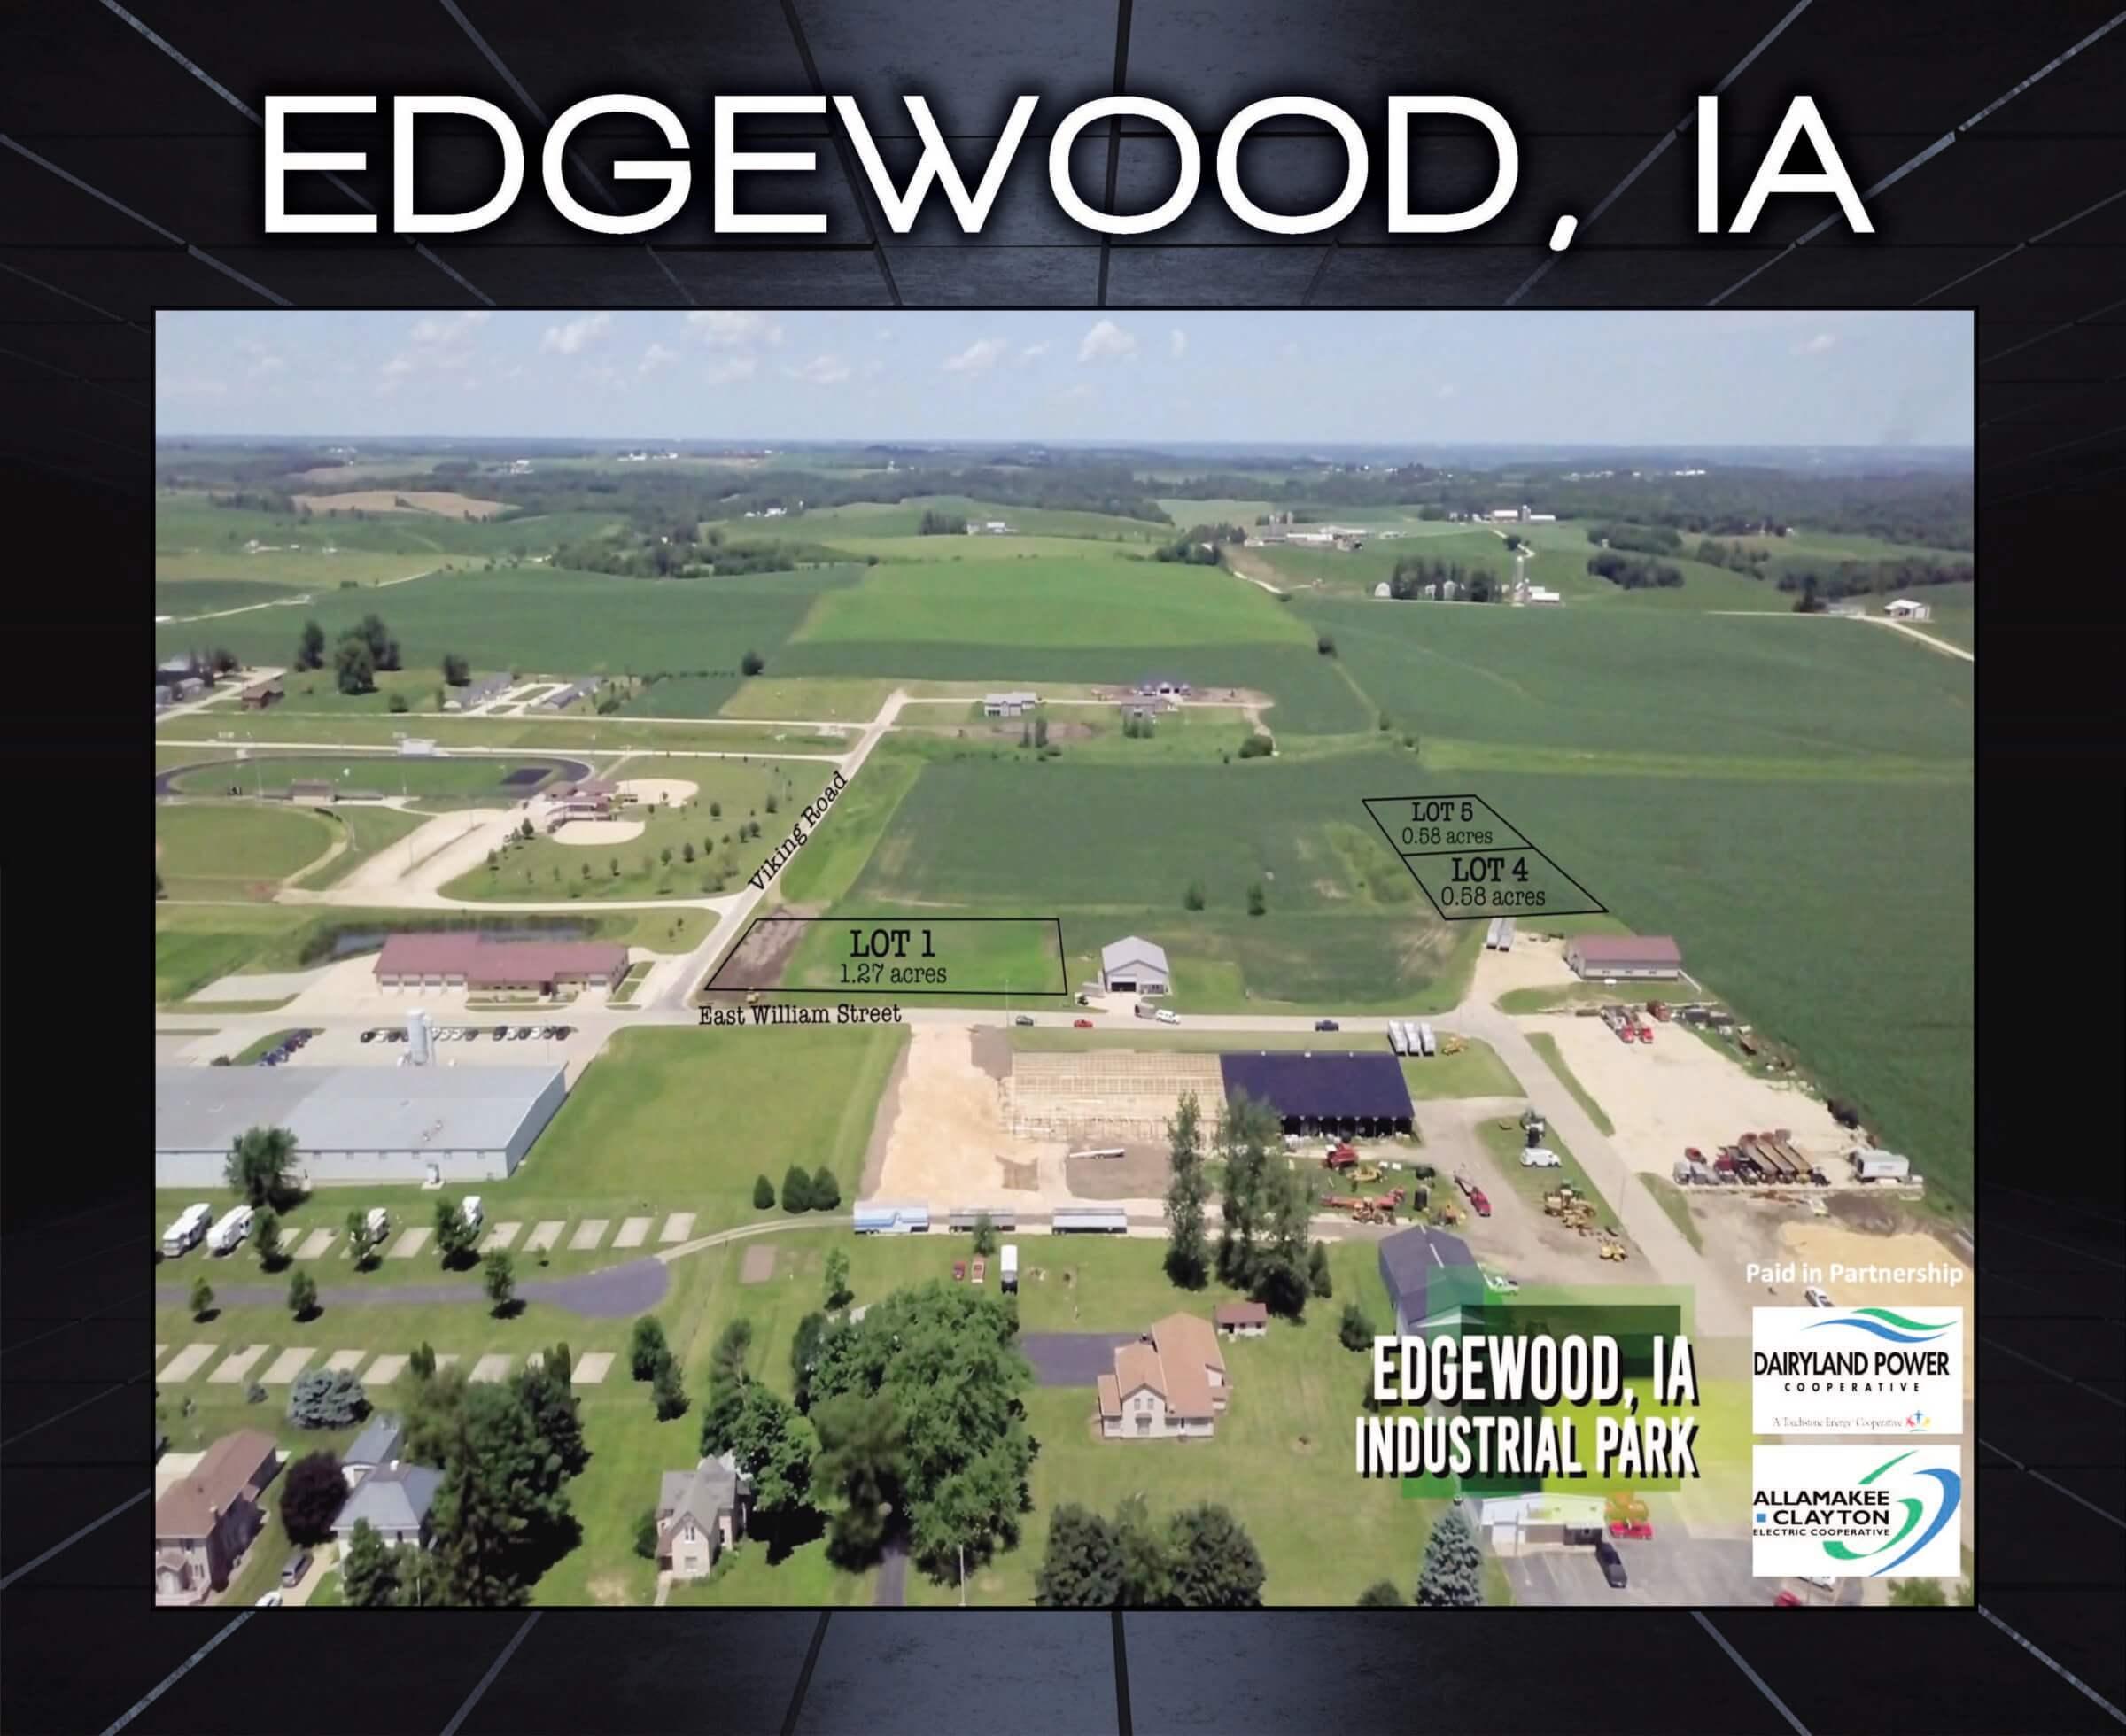 Edgewood Industrial